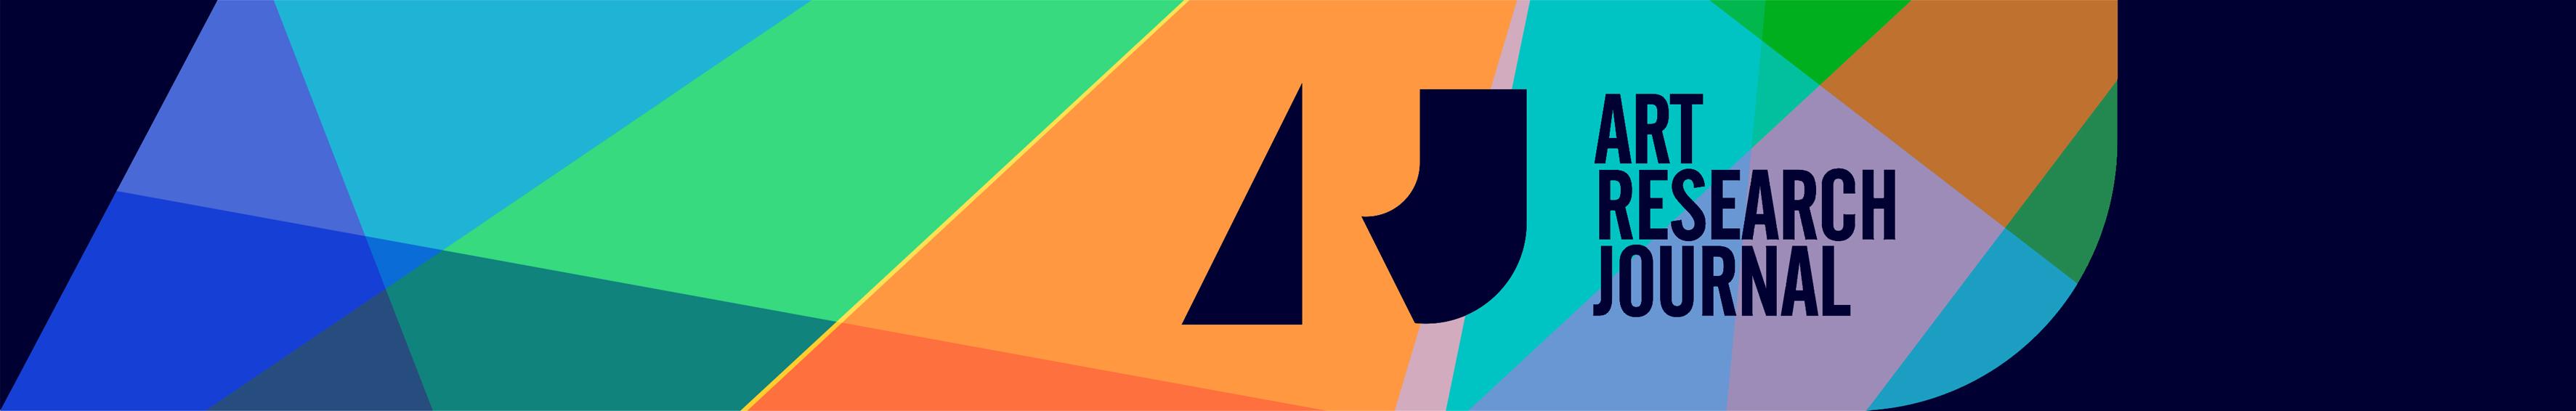 ARJ — Art Research Journal / Revista de Pesquisa em Artes